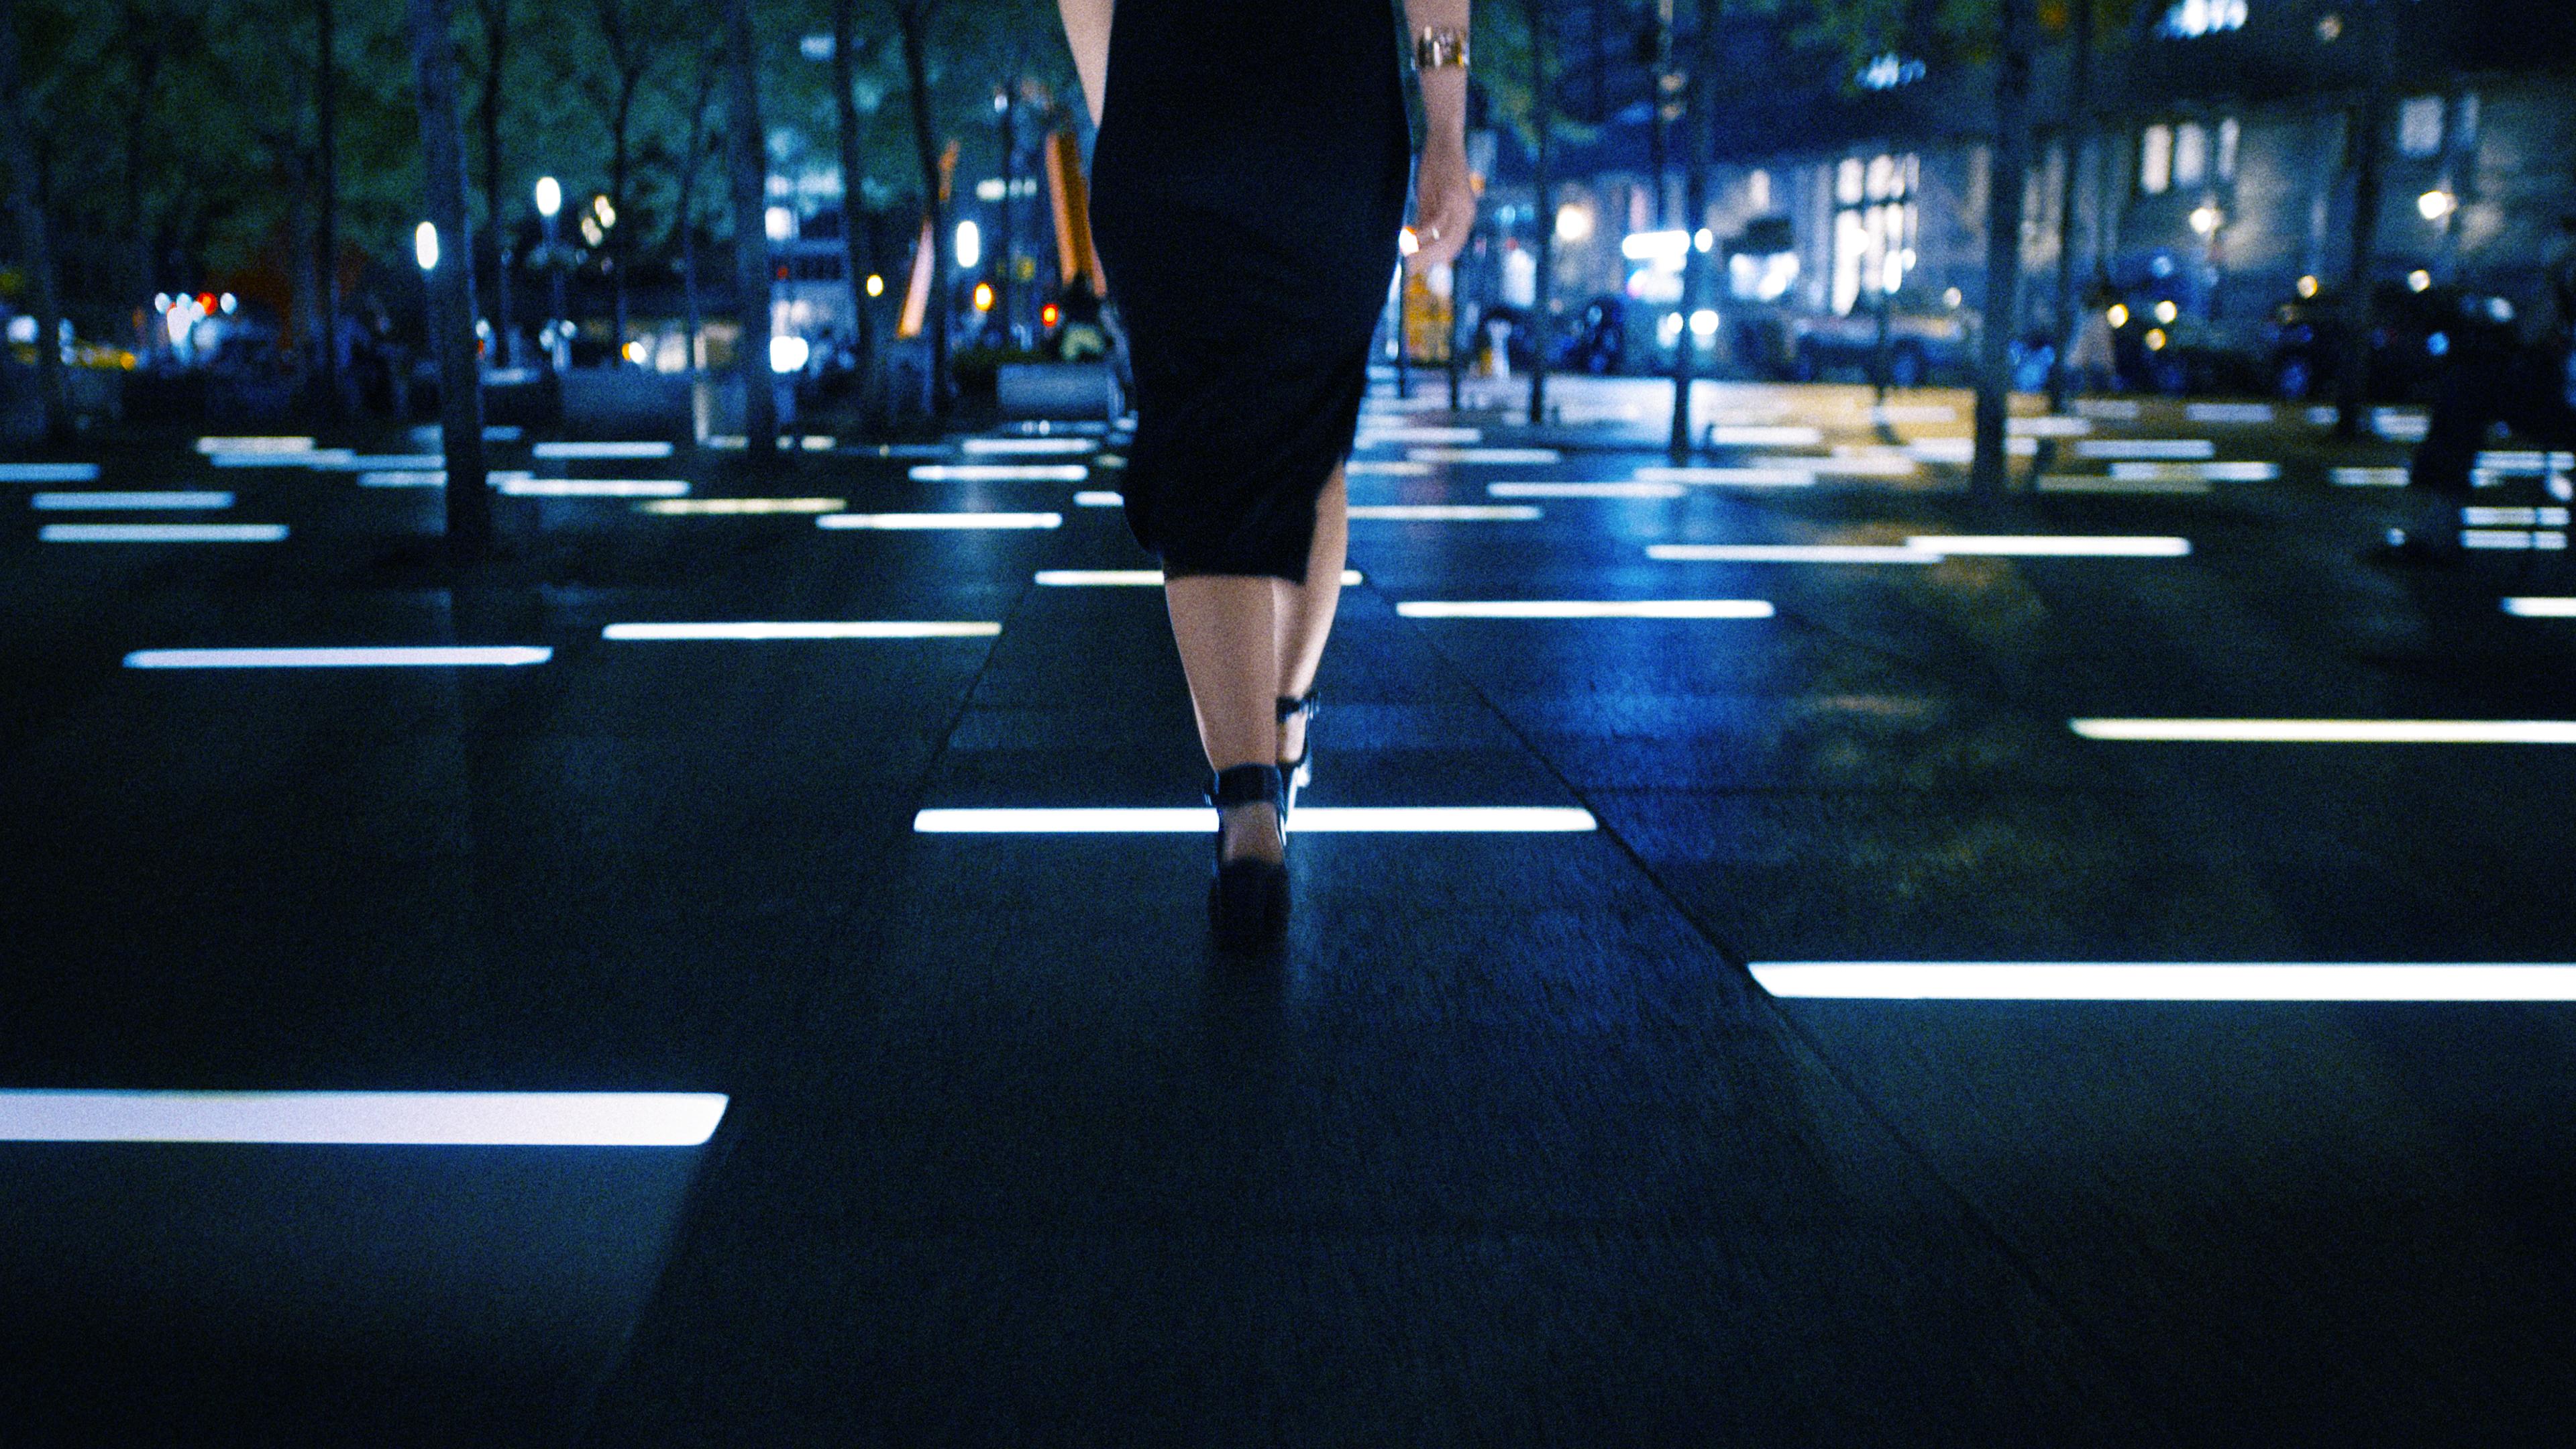 alex-youth-video-frame-rachel-walking-across-light-tiles